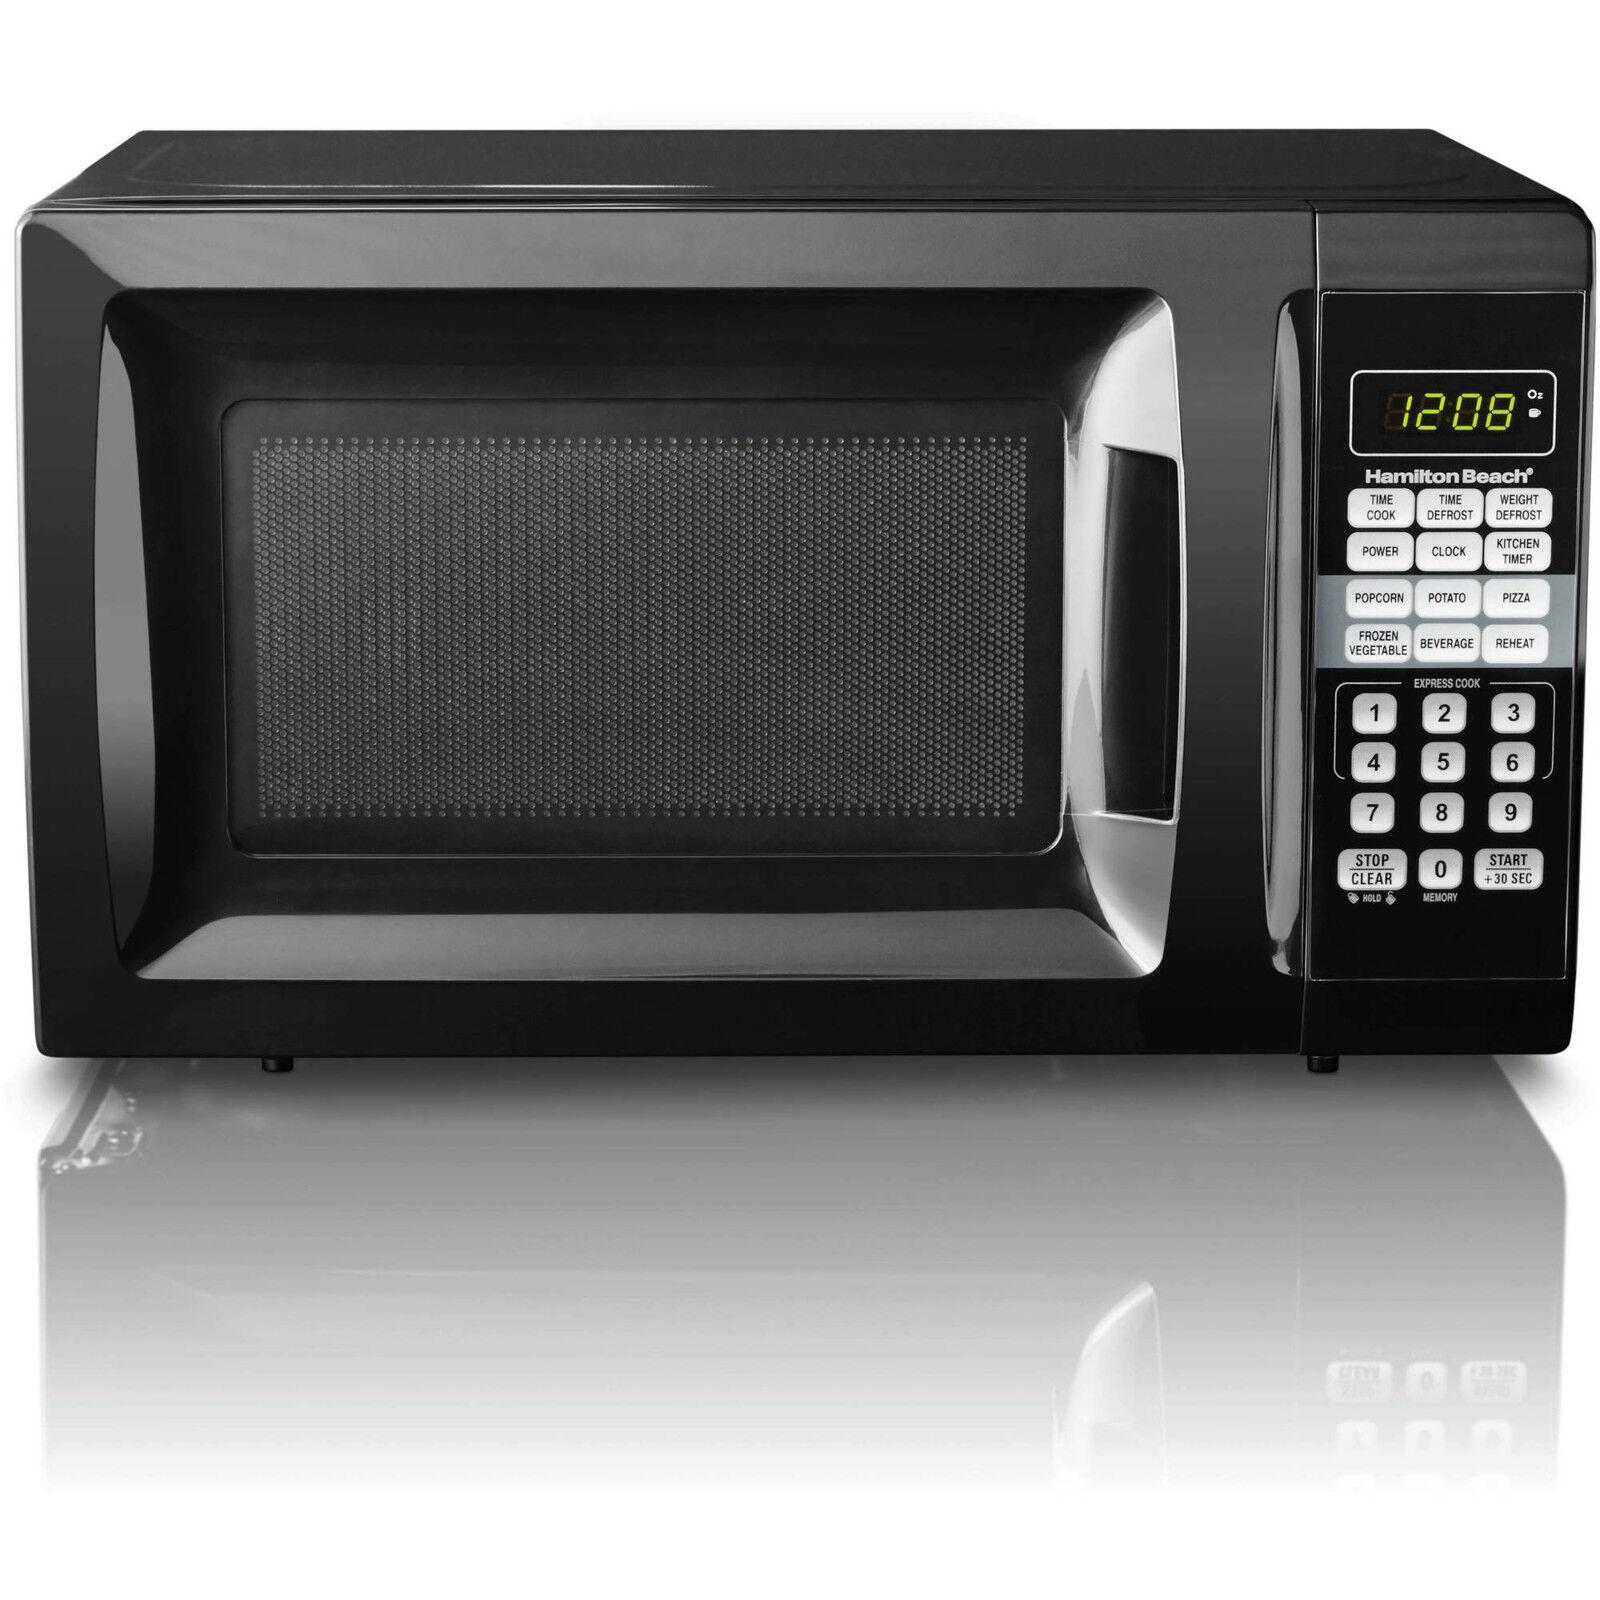 Hamilton Beach 0.7 cu ft Microwave Oven 10 power levels 6 qu